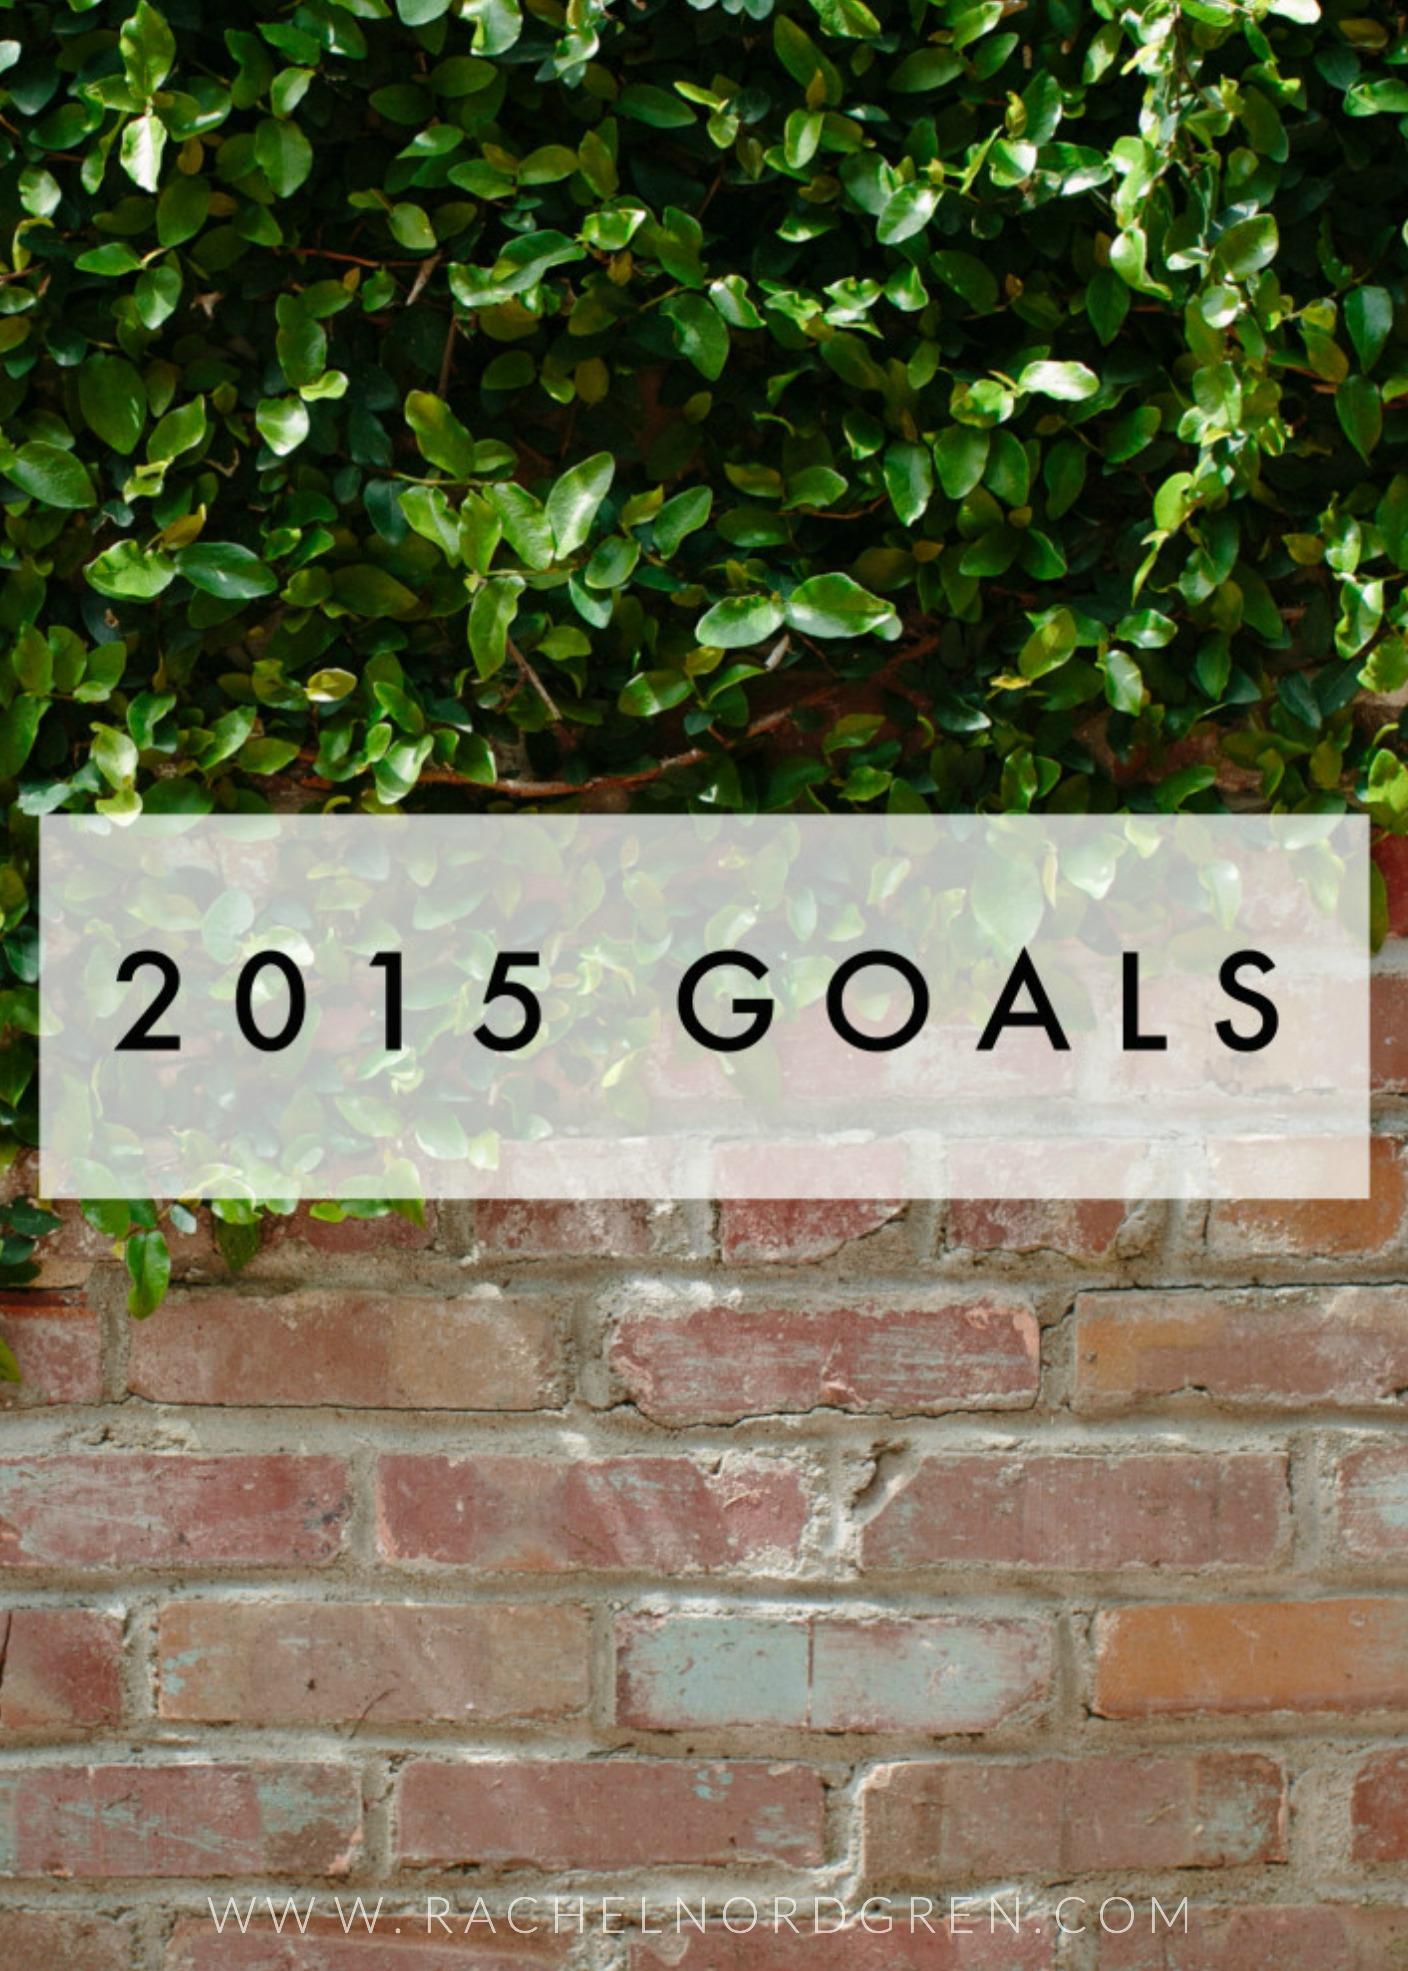 2015 Goal Setting with the Lara Casey PowersSheets | Rachel Nordgren